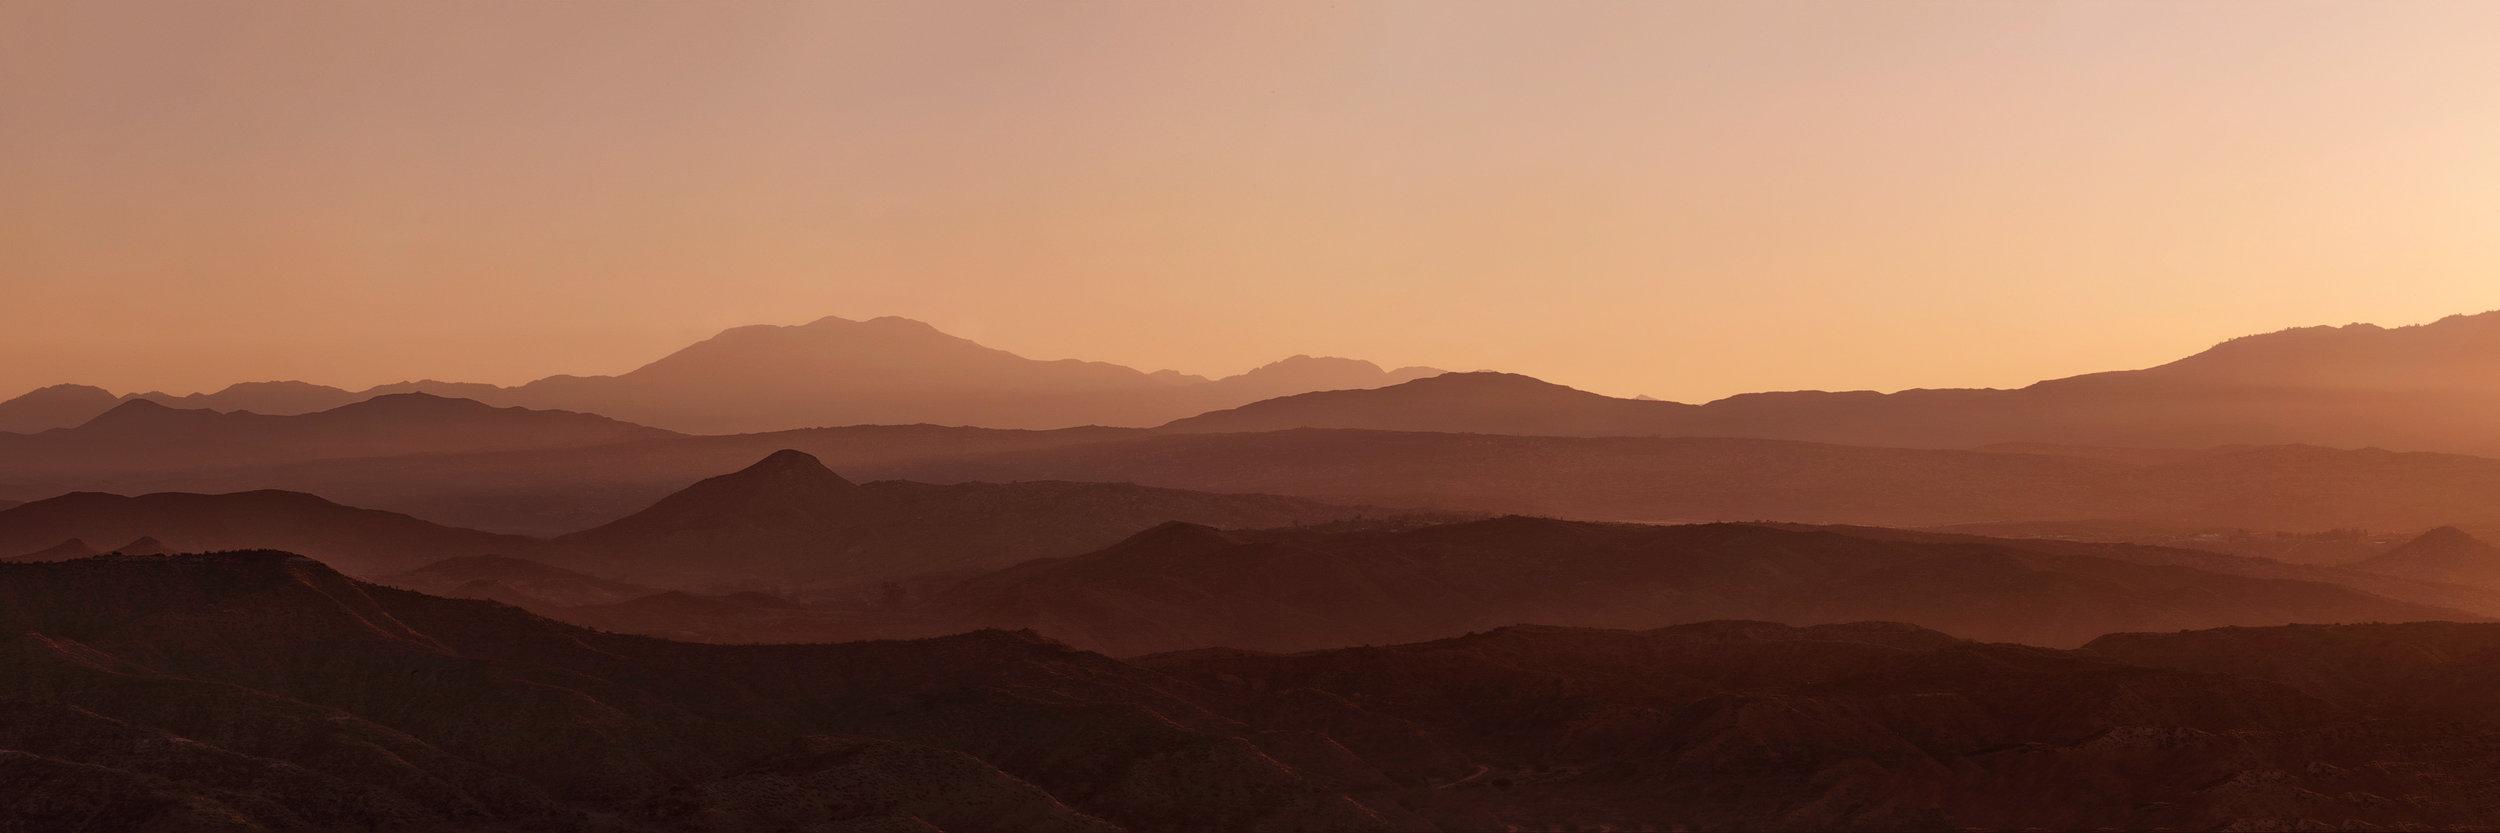 Untitled_Panorama1v3.jpg